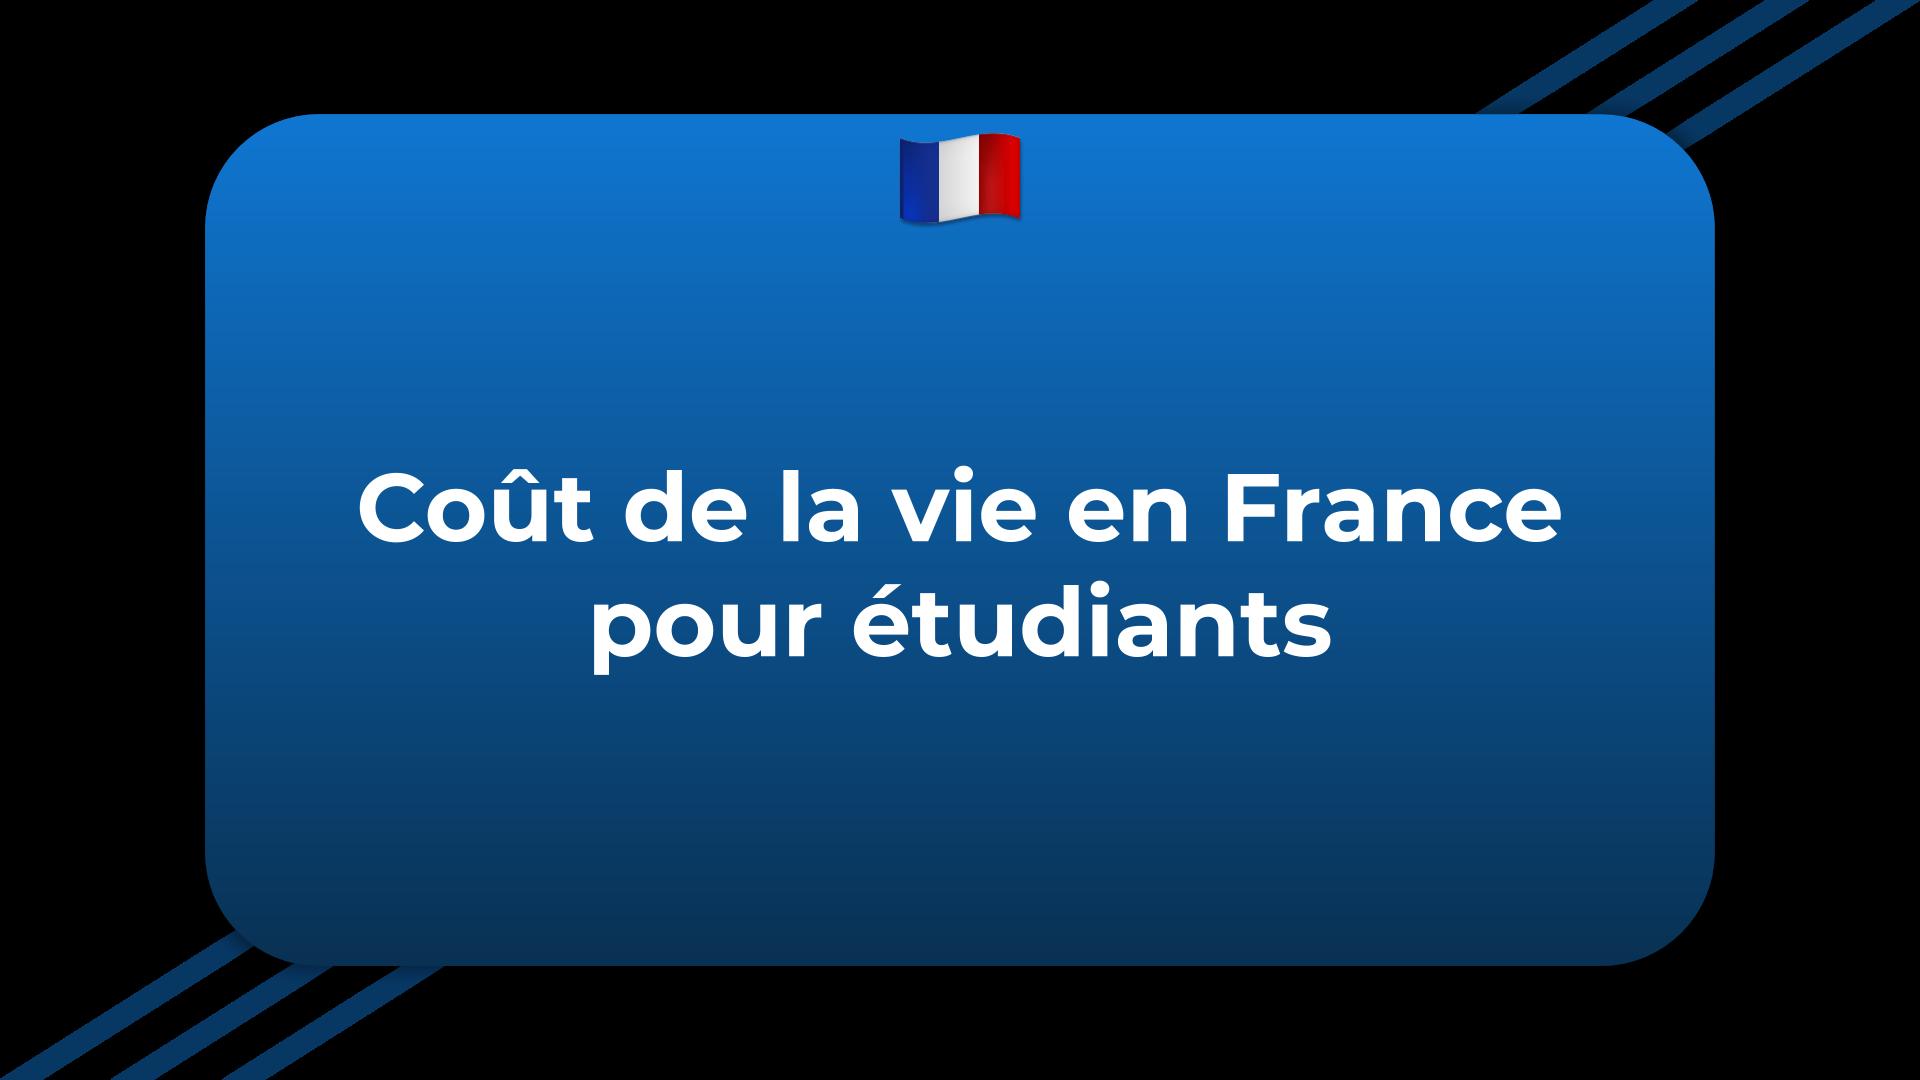 Coût de la vie en France